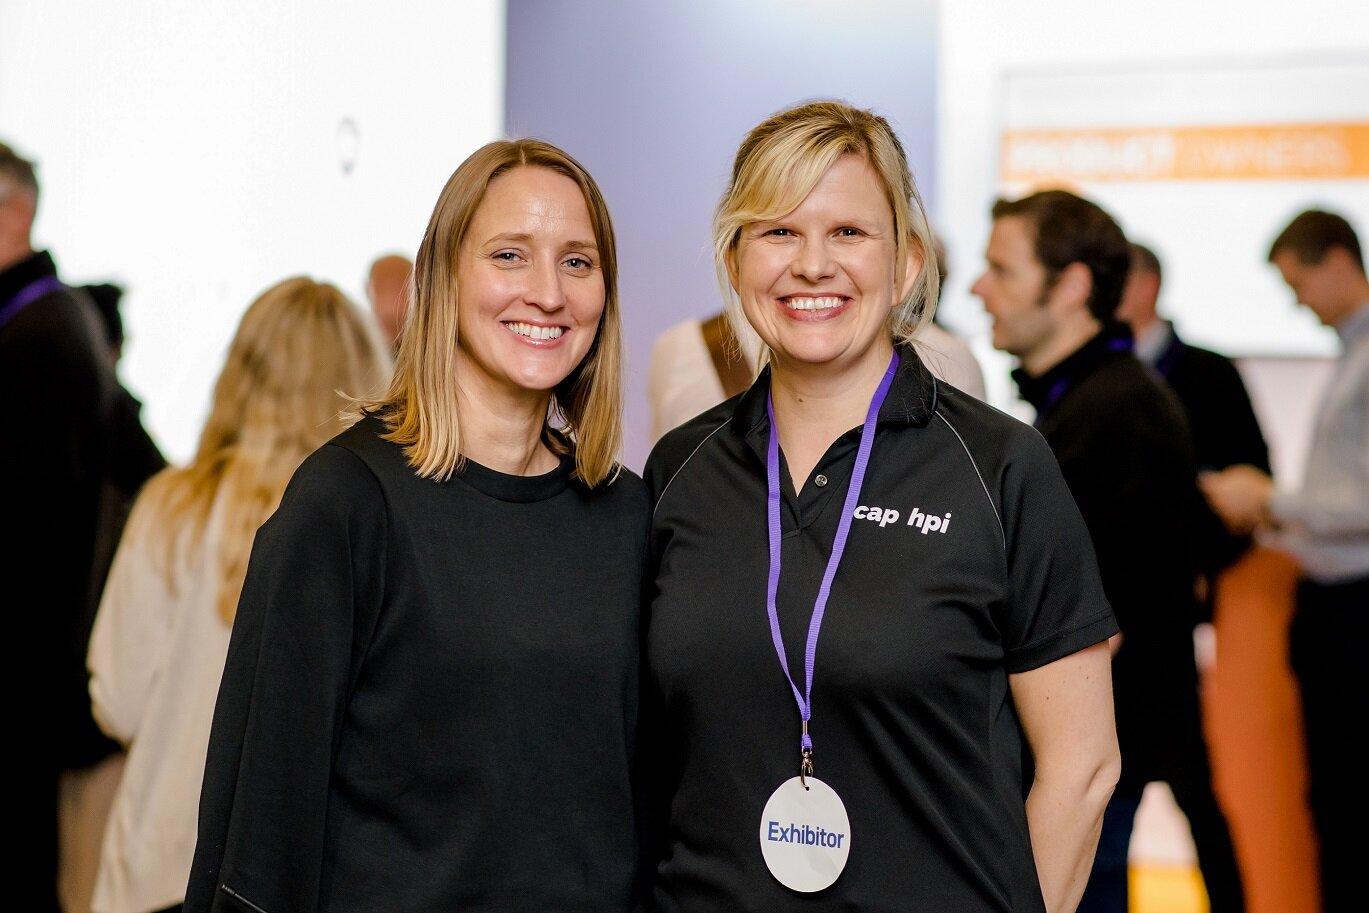 Amy De-Balsi (left) with Helen Wright, Head of Development at cap hpi